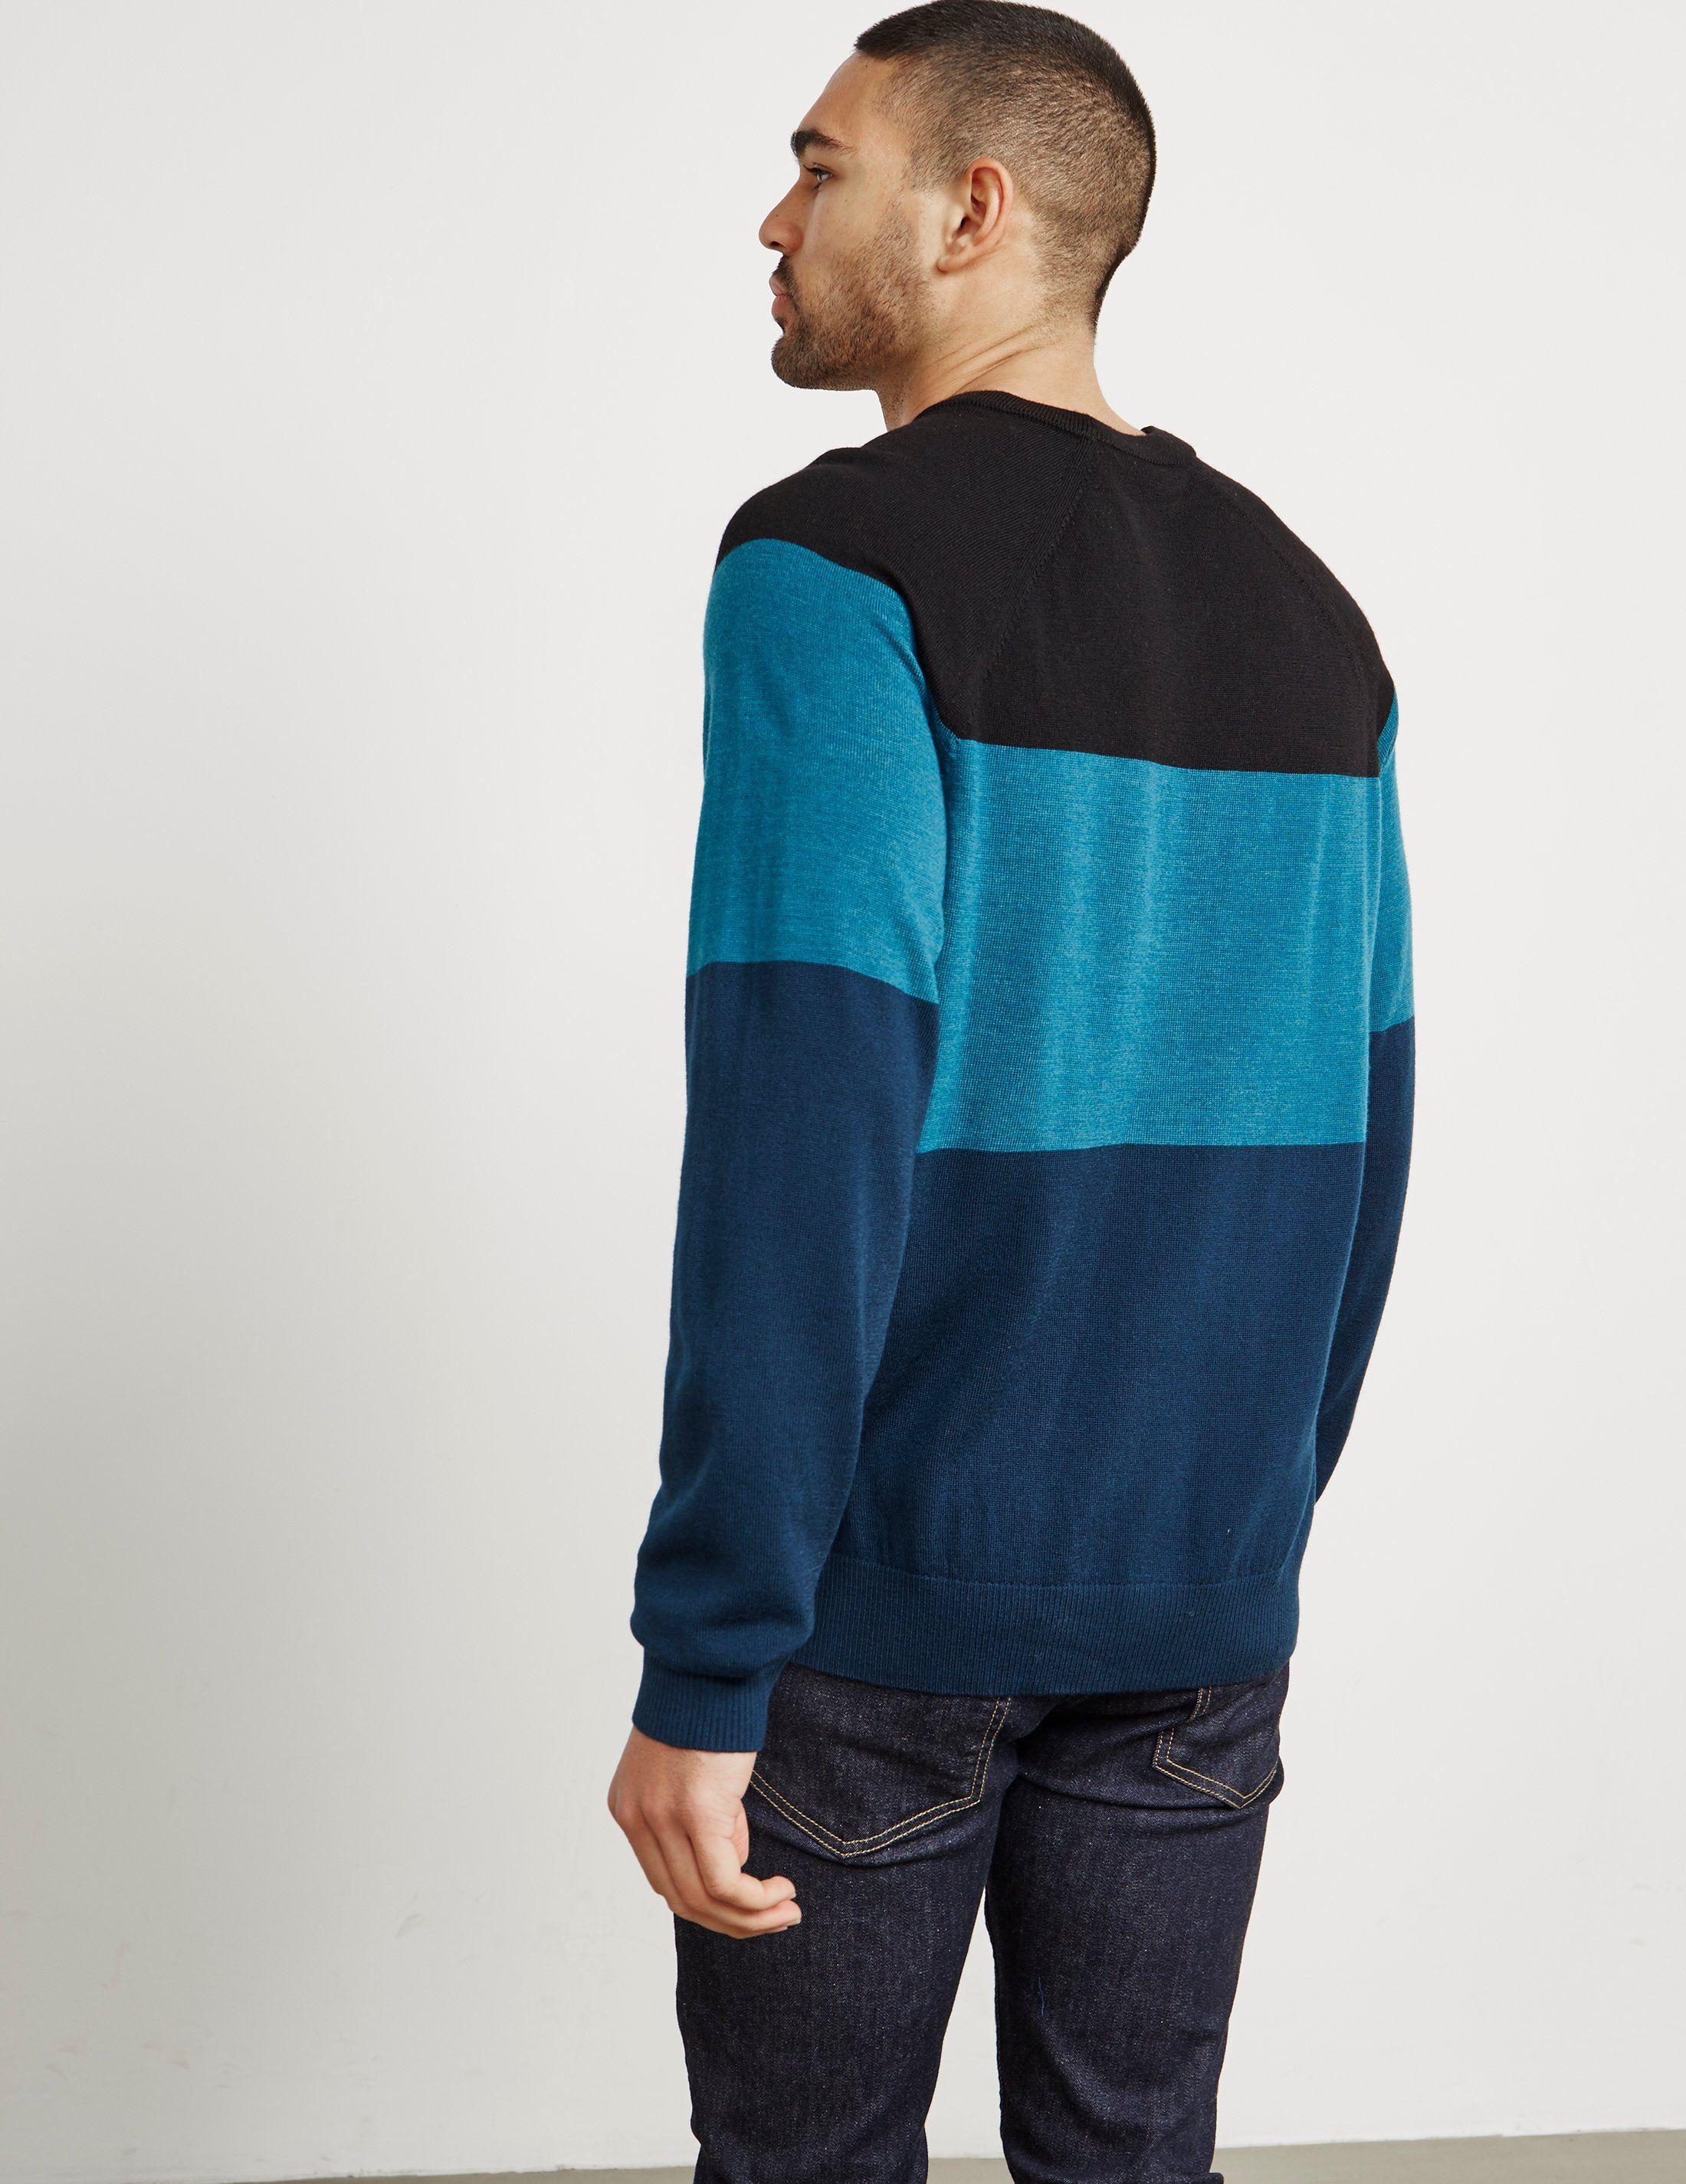 Michael Kors Block Knitted Jumper